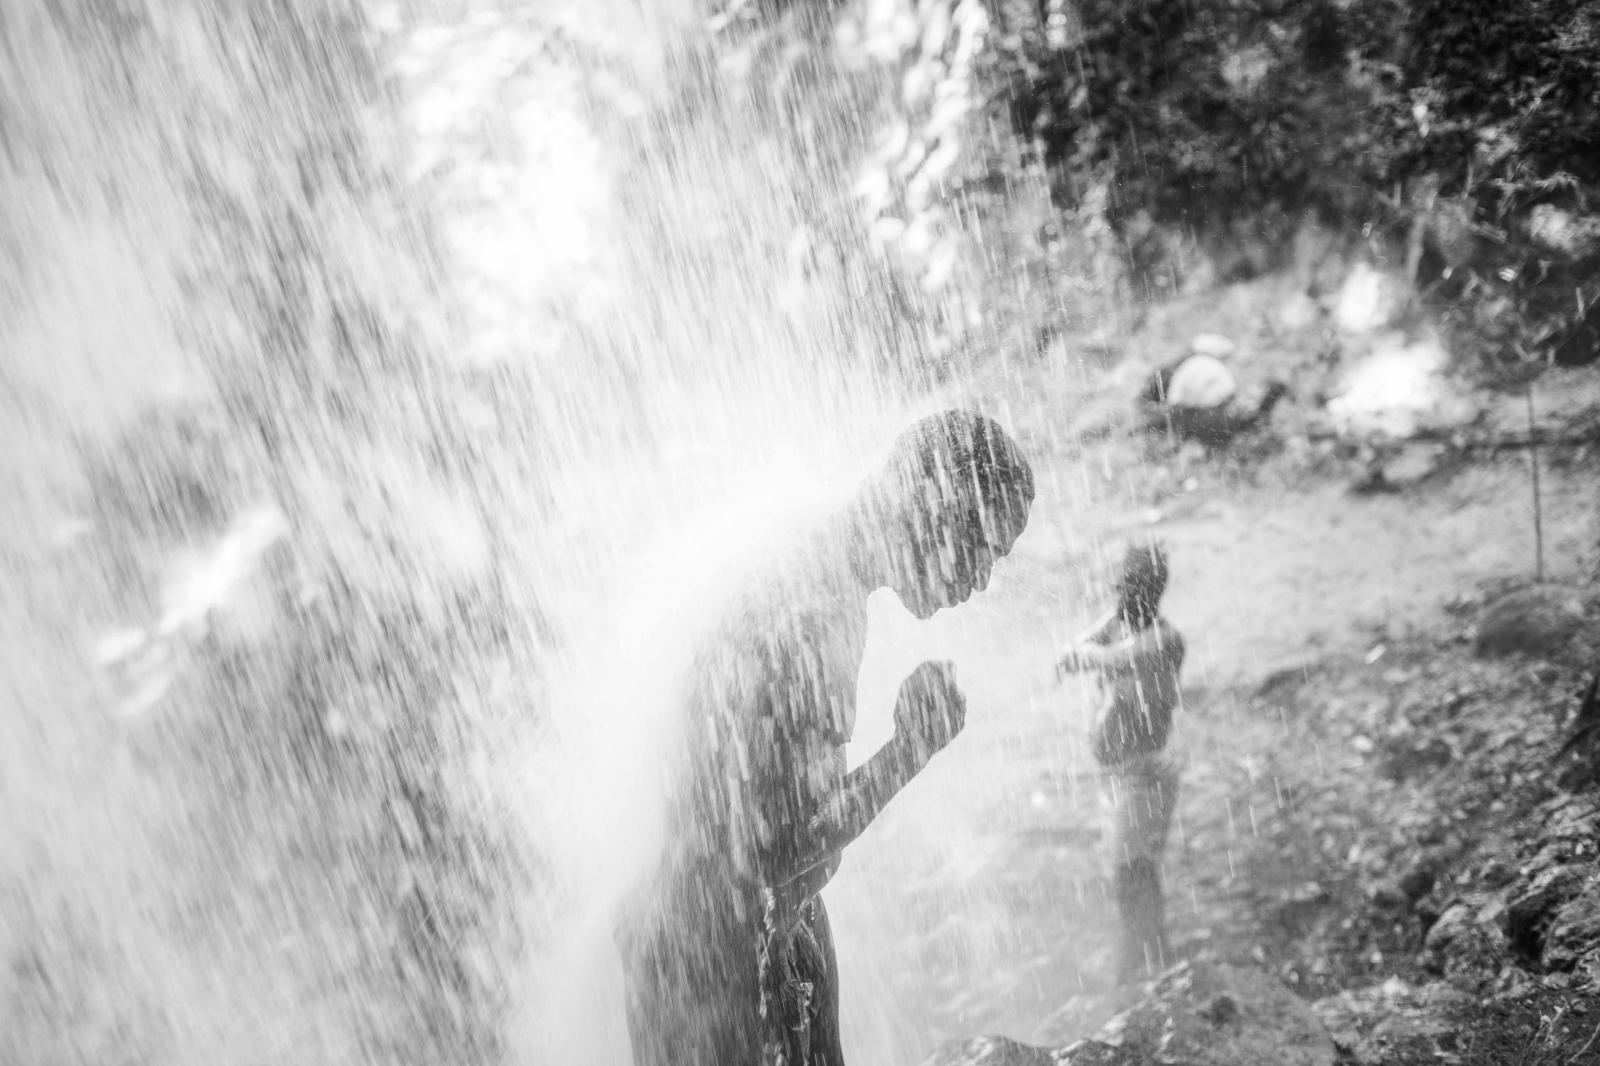 Art and Documentary Photography - Loading _MJ_0152.JPG